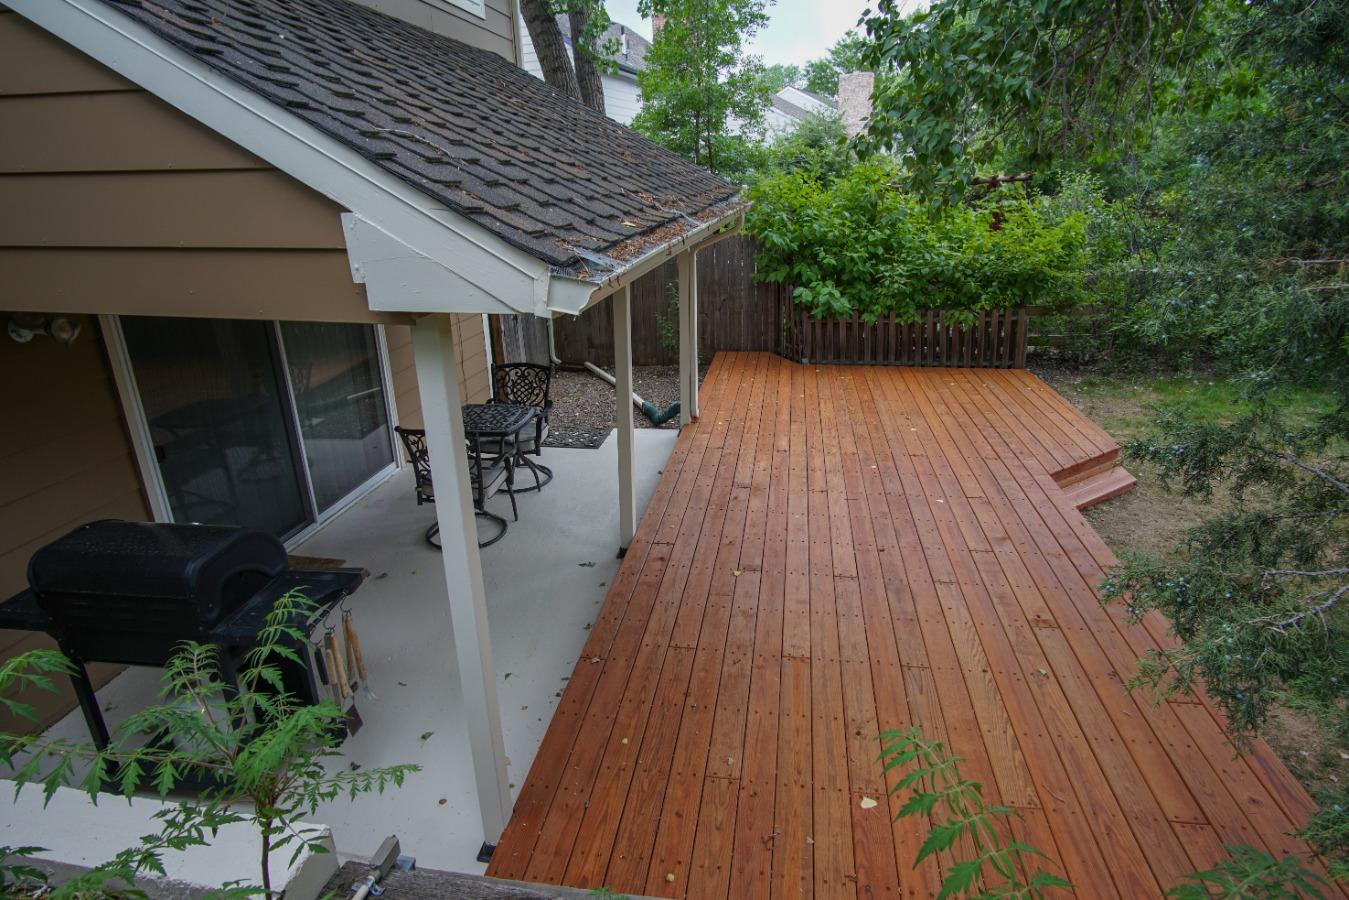 Backyard entertainment spaces